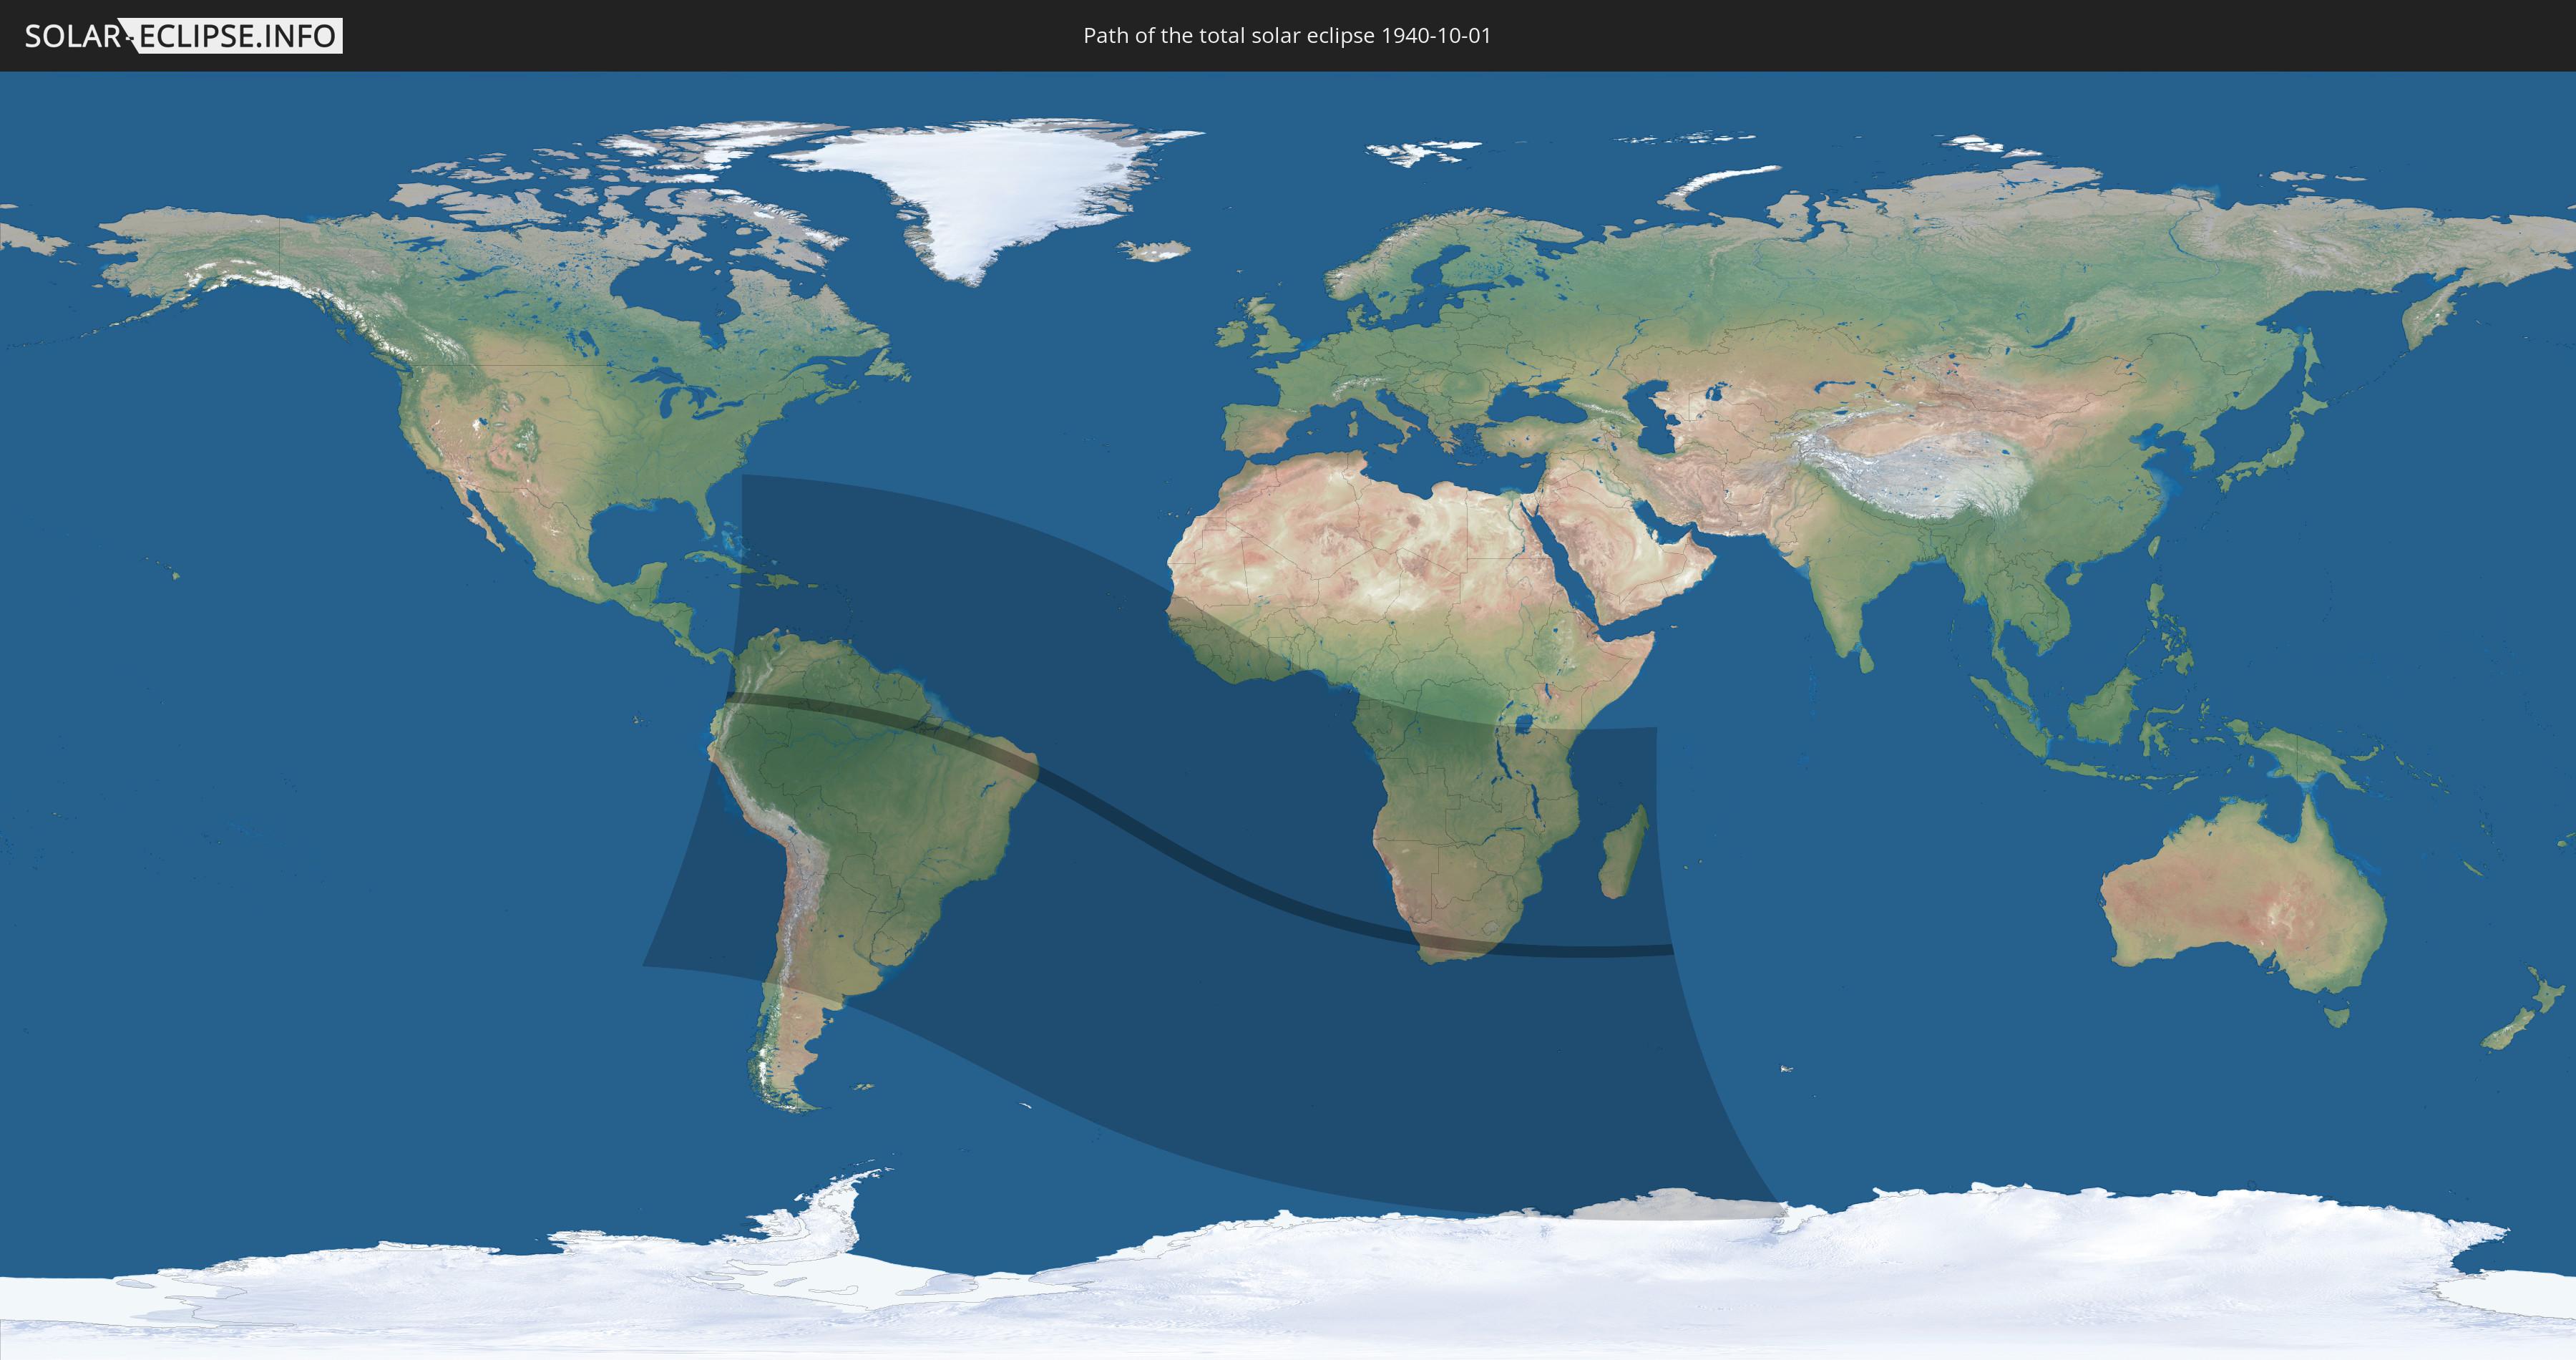 Totale Sonnenfinsternis vom 01.10.1940